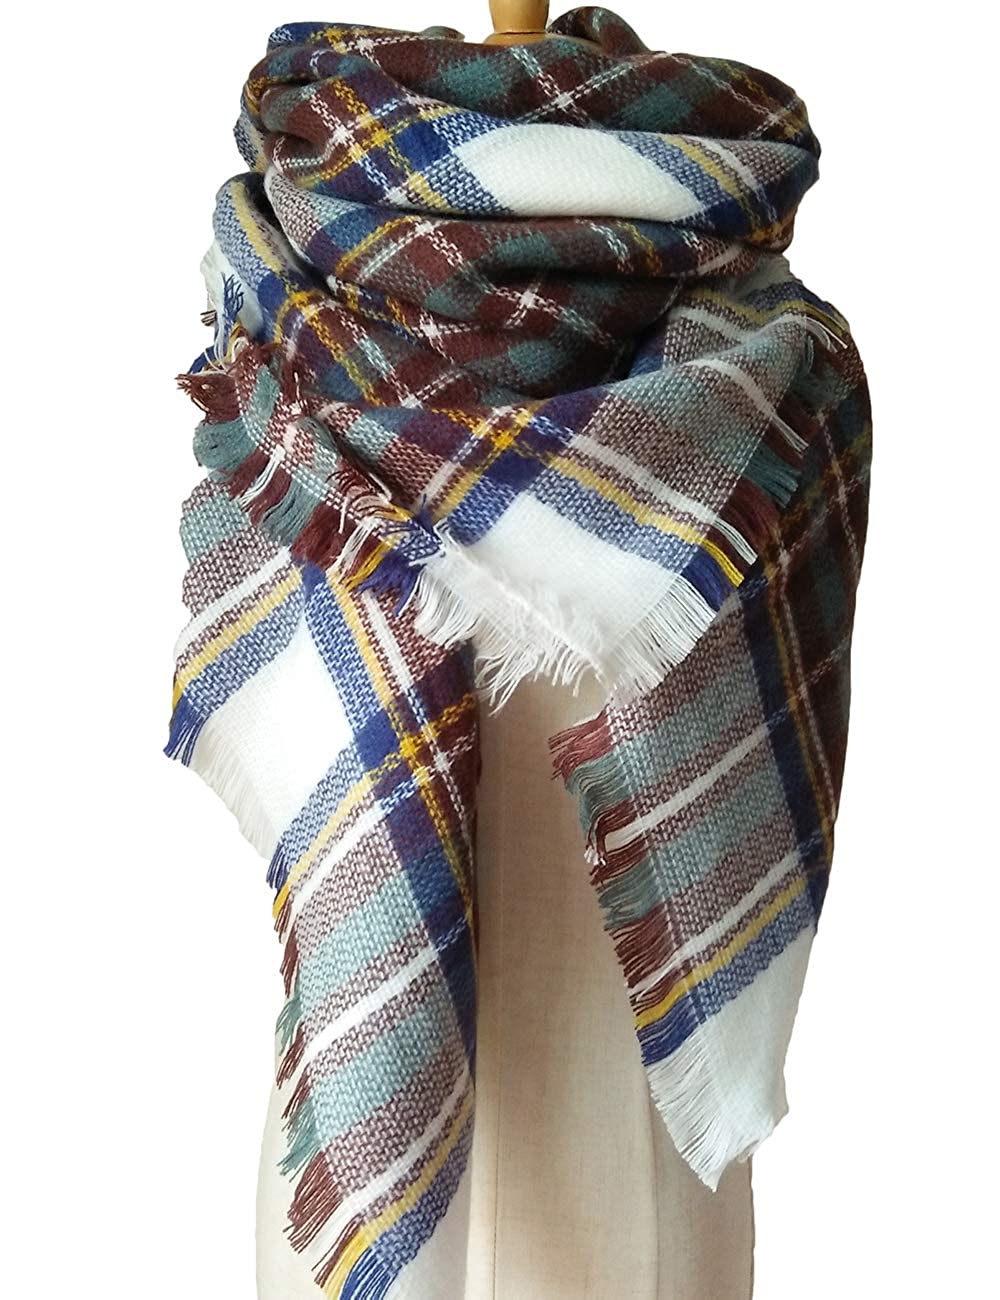 Lncropo Women's Plaid Scarf Winter Oversized Scarves Tartan Shawl Wrap Blanket Scarf Warm Tassels Pashmina Poncho Scarf